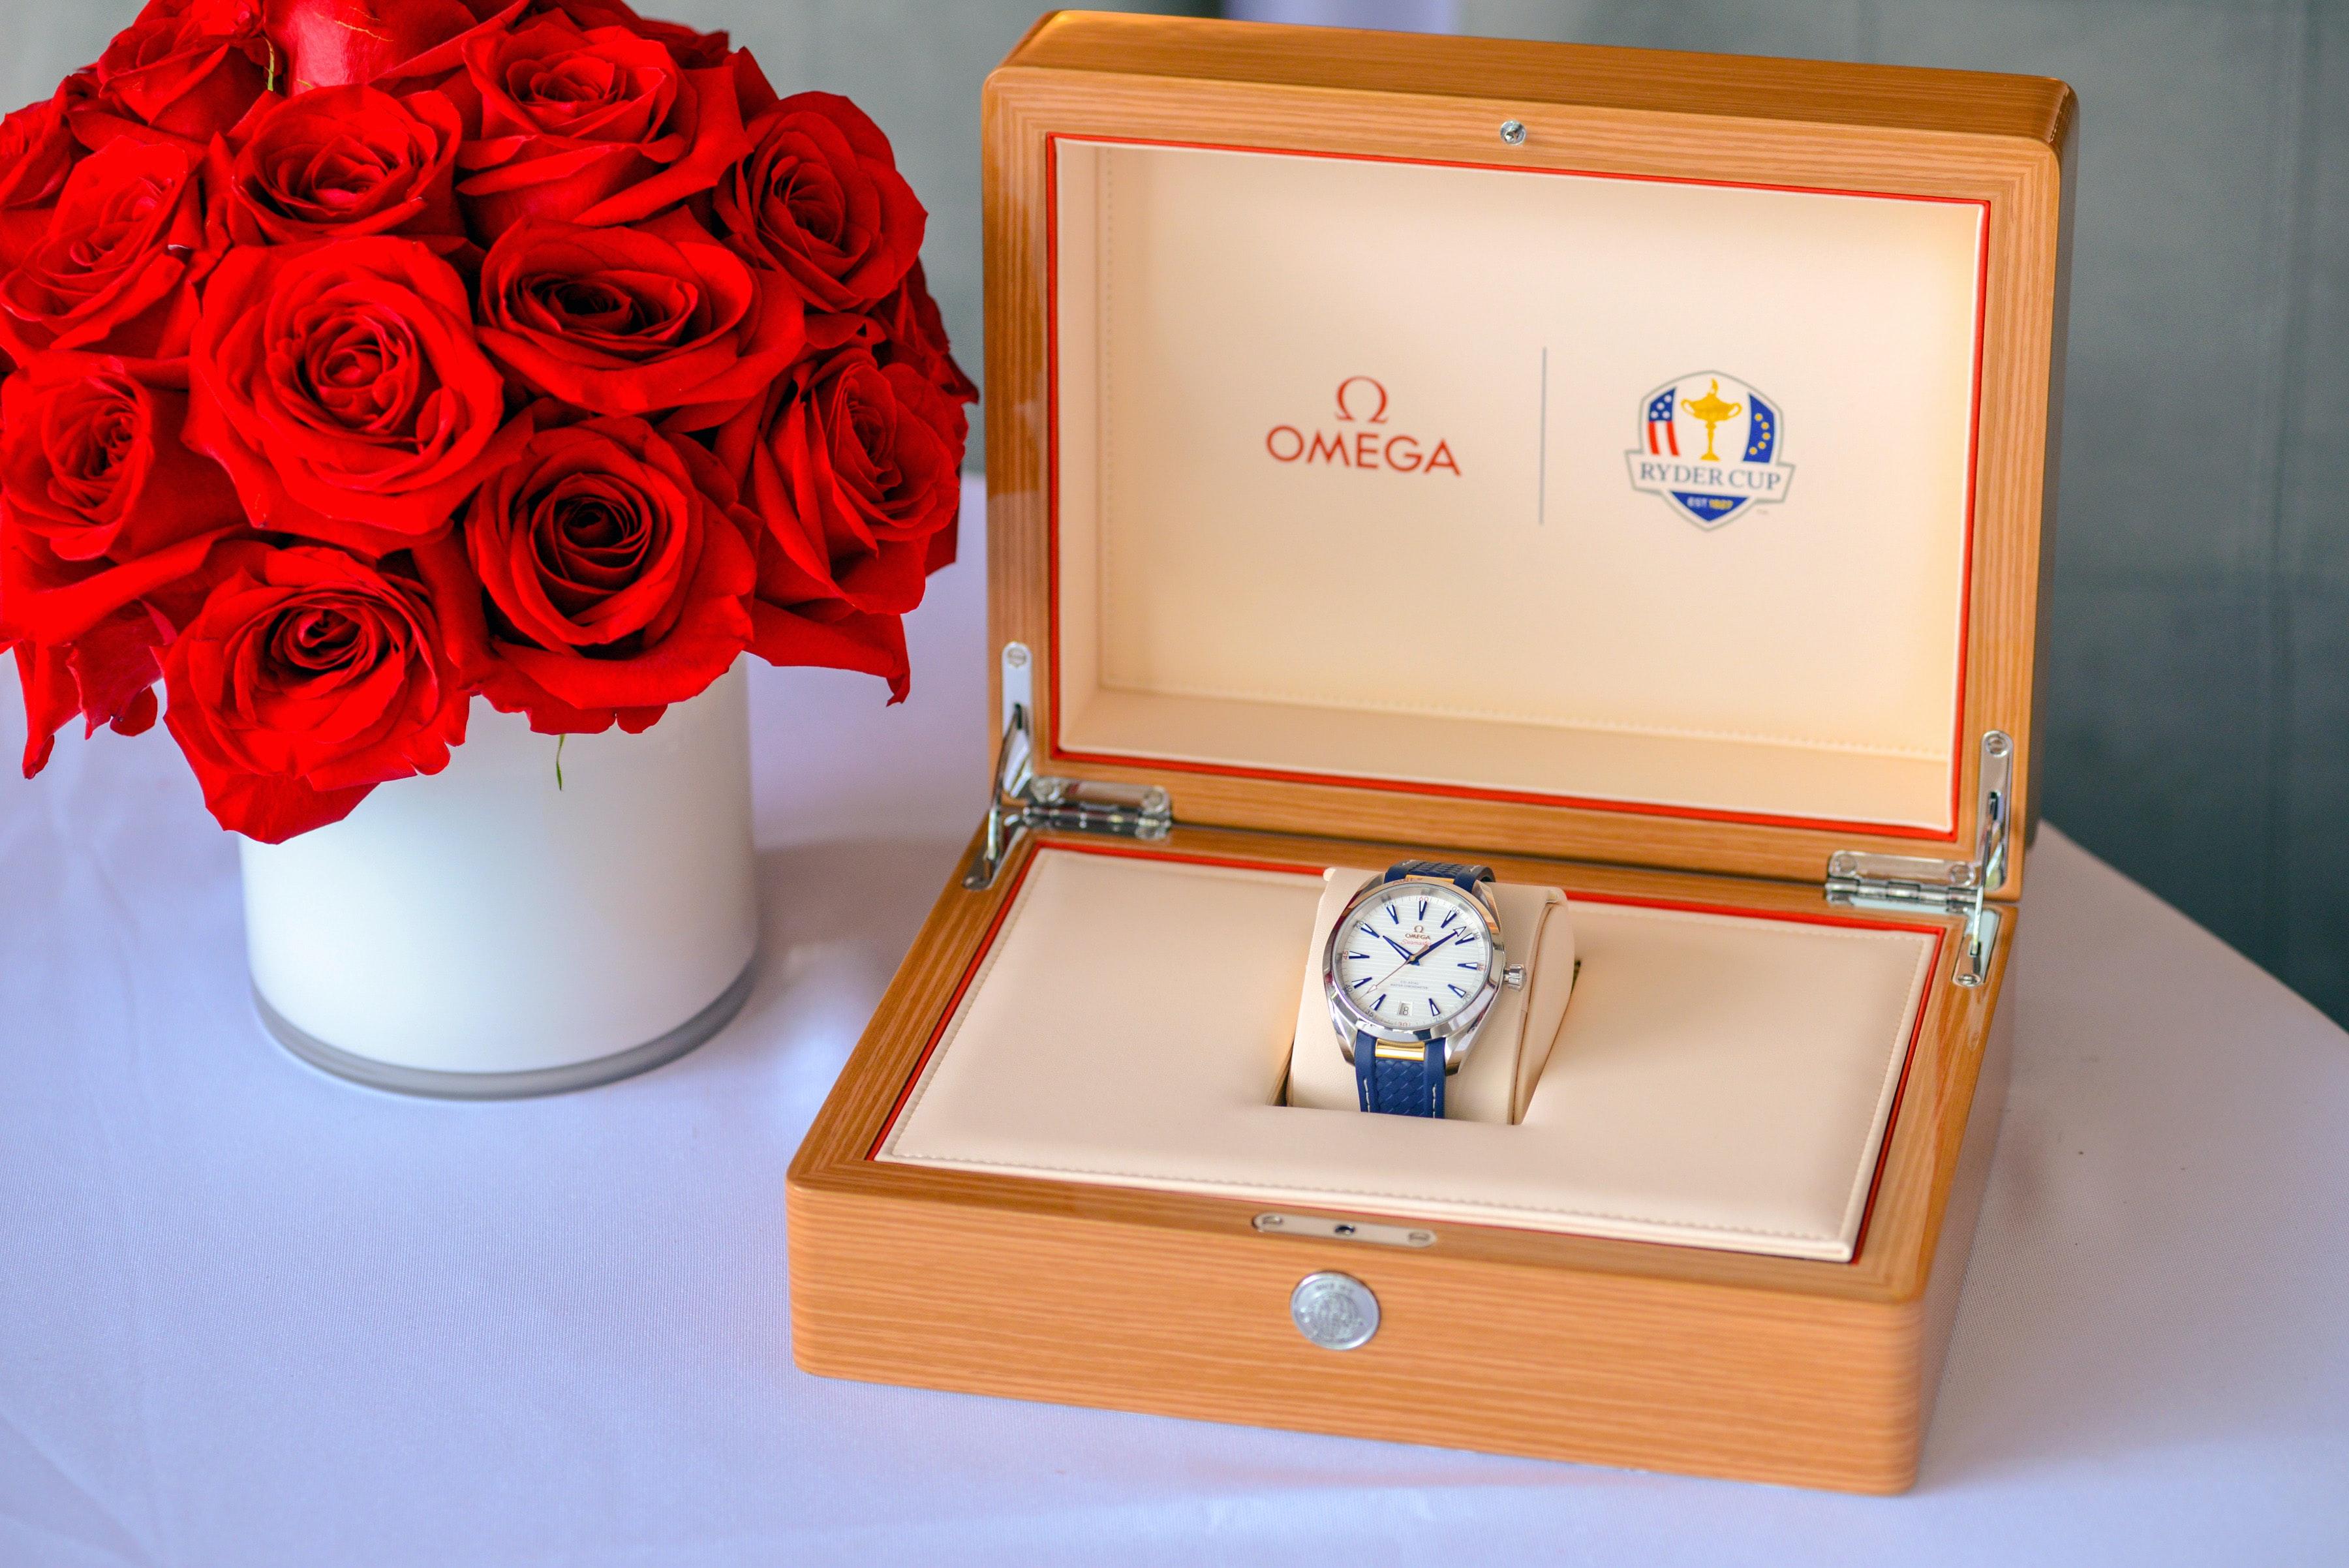 Introducing: The Omega Seamaster Aqua Terra 150M 'Ryder Cup' Seamaster Aqua Terra Ryder Cup Timepiece in Presentation Box